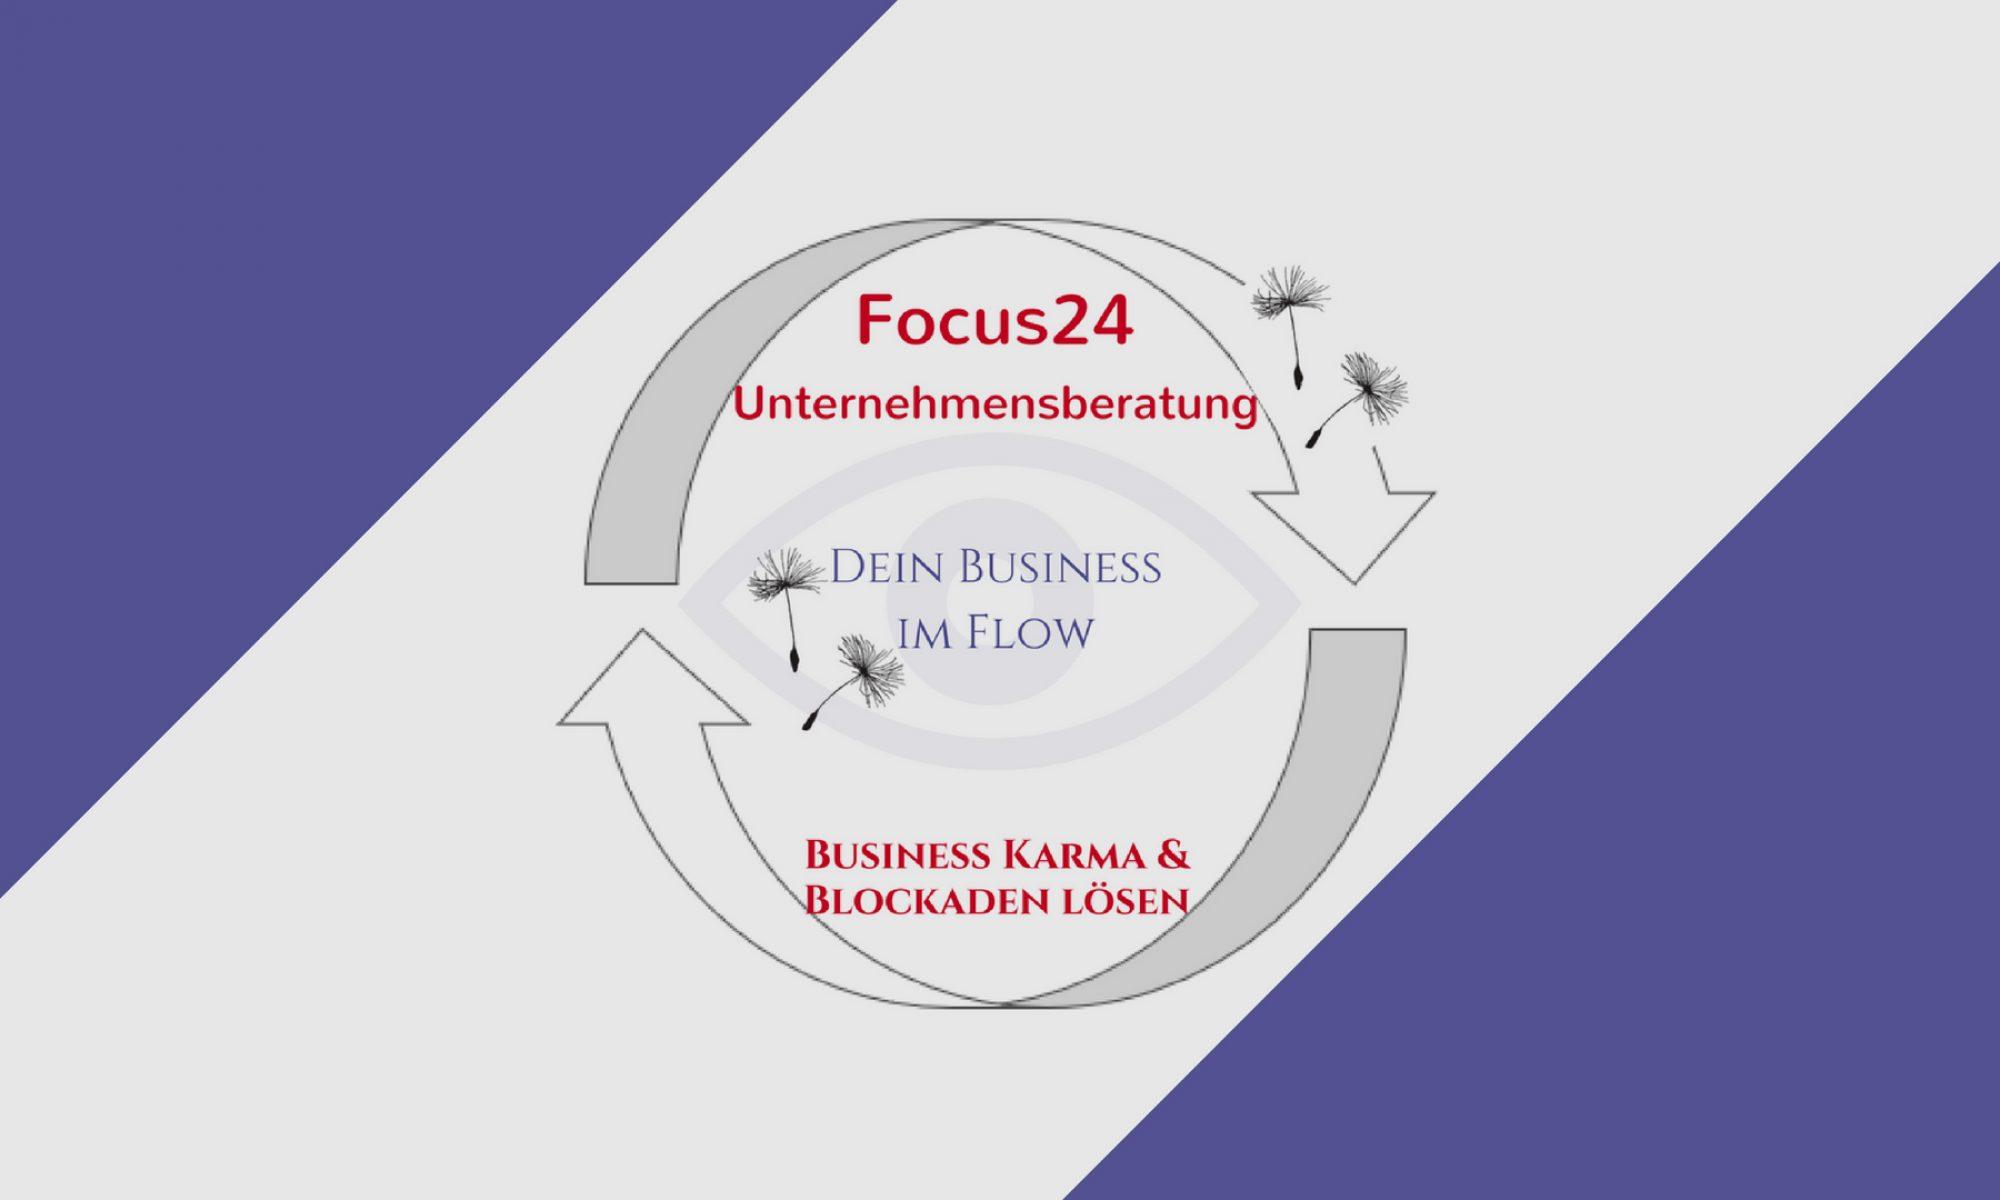 Focus24 - Unternehmensberatung